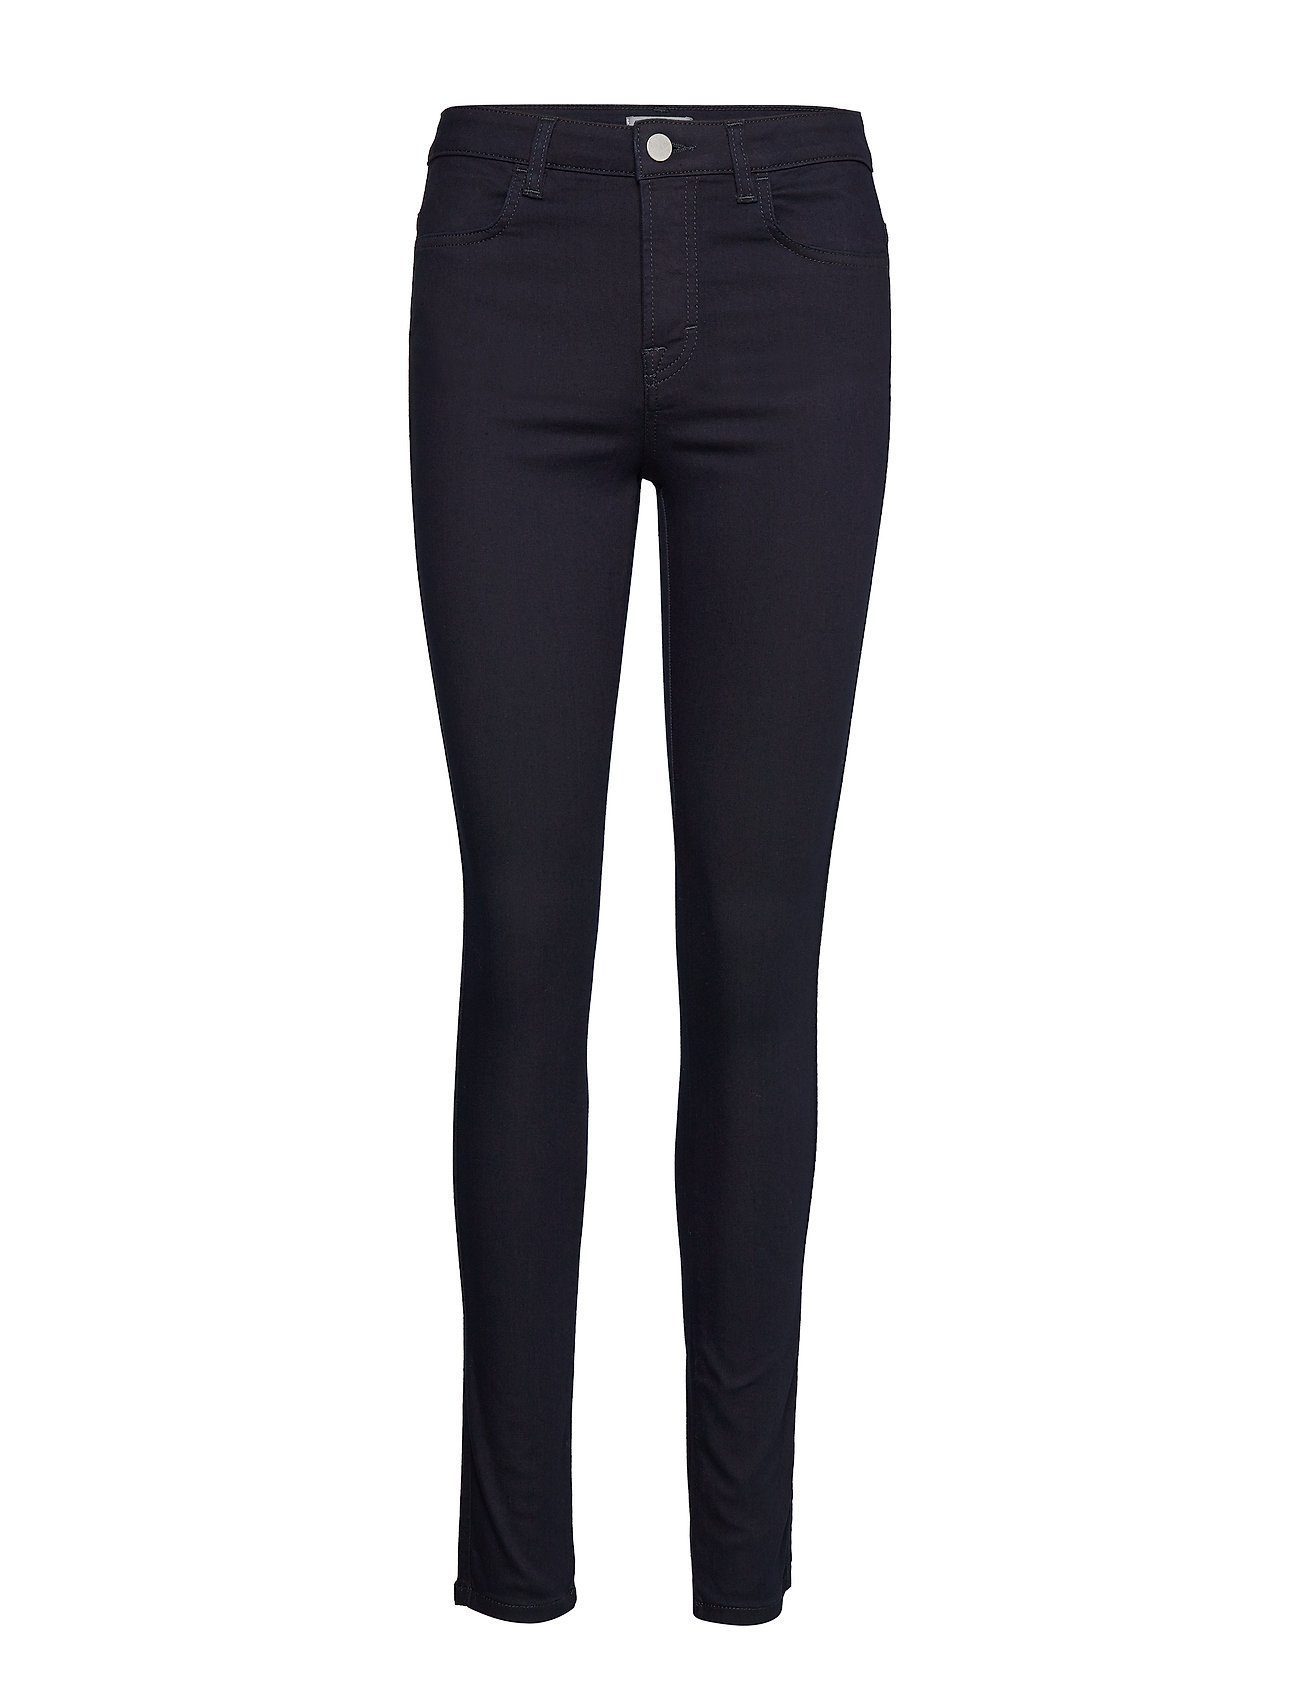 Image of Lola Super Stretch Jeans Skinny Jeans Blå Filippa K (3347377679)